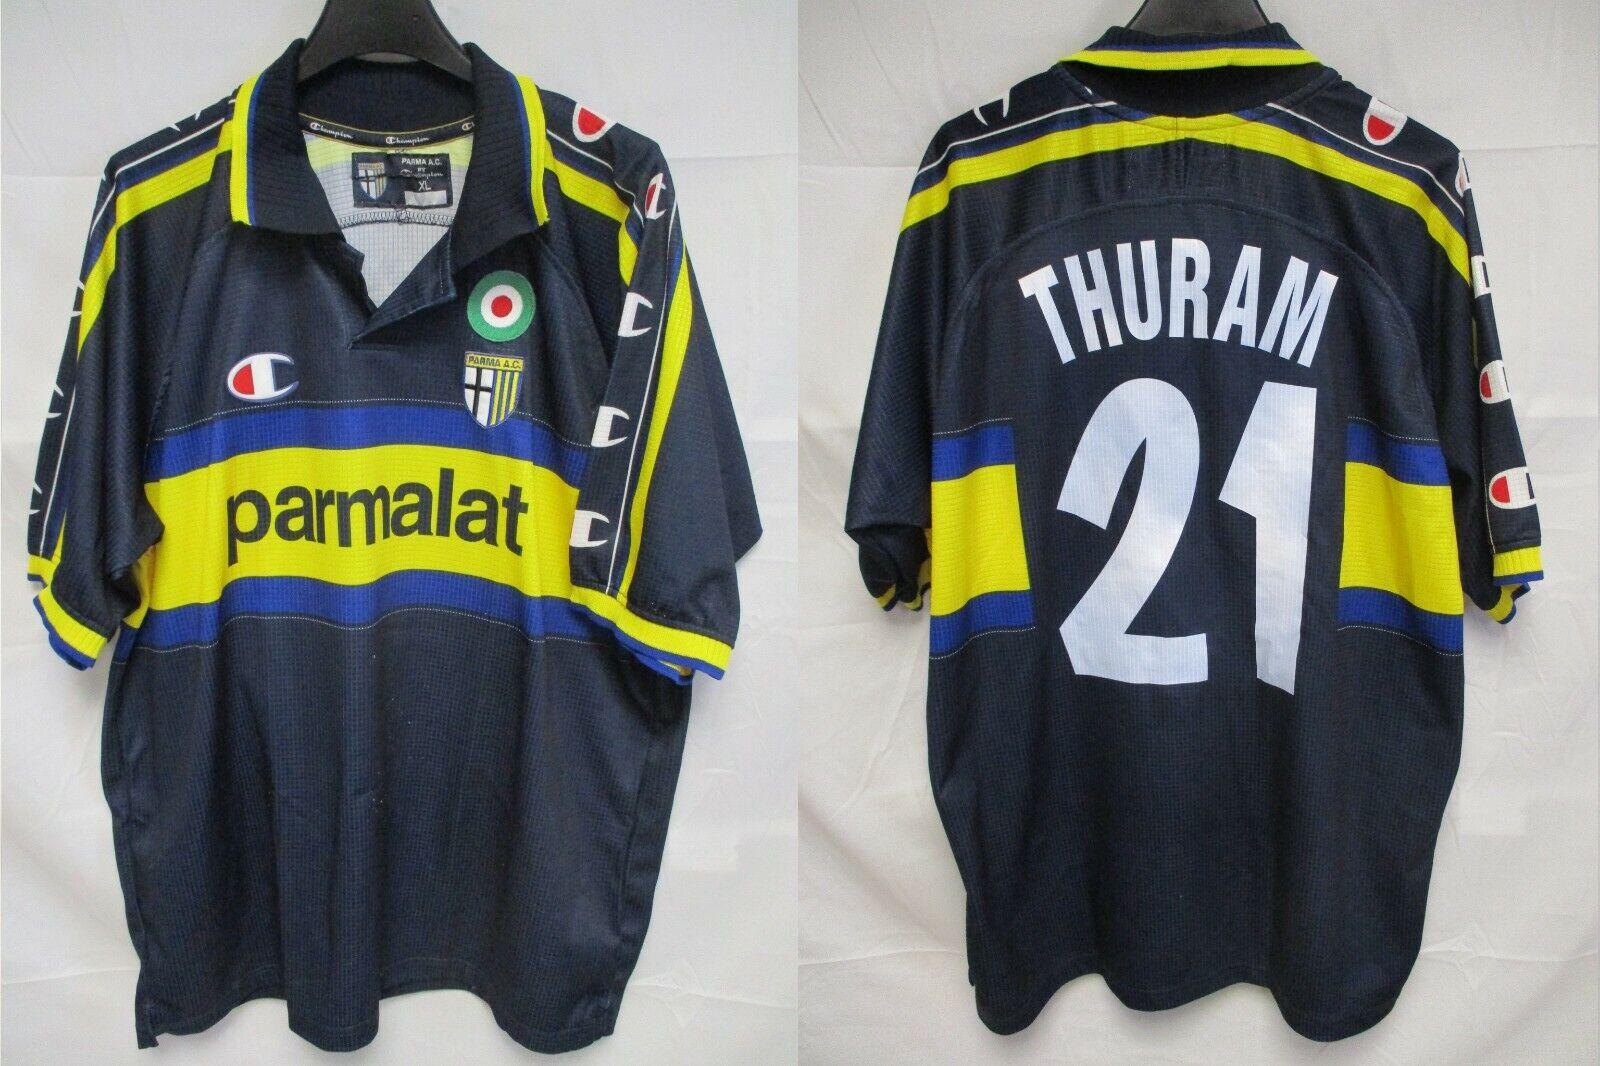 Maillot PARME PARMA AC 1999 2000 vintage THURAM n21 maglia CHAMPION USA shirt XL